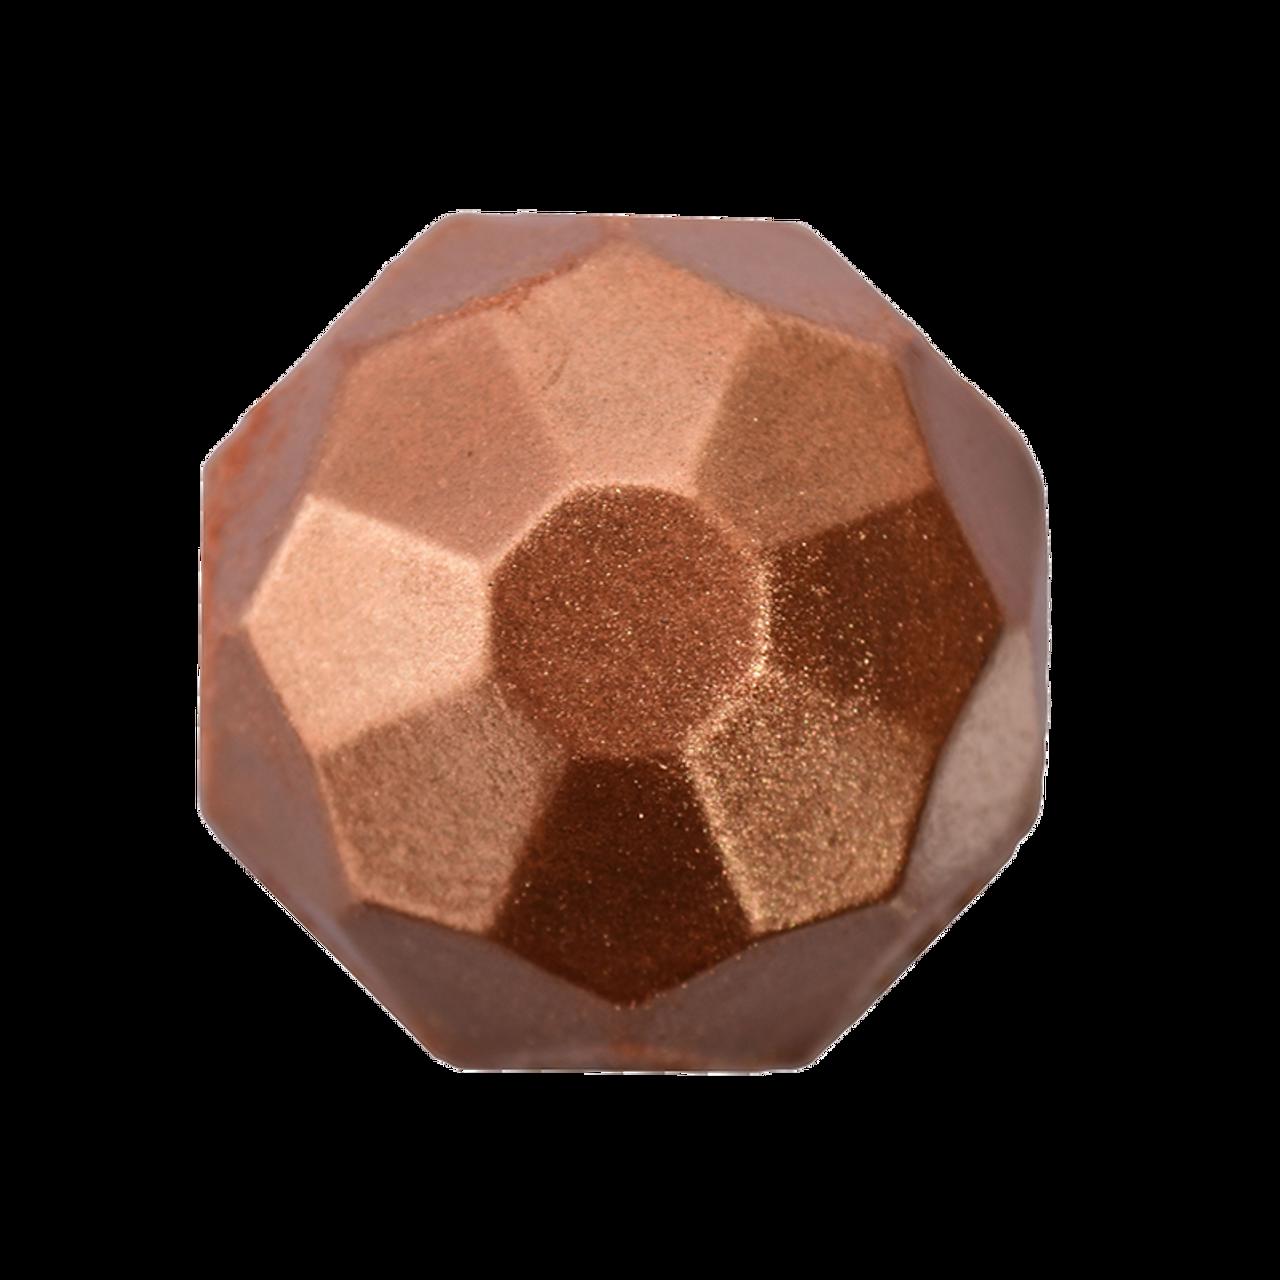 Bronze Polish on chocolate